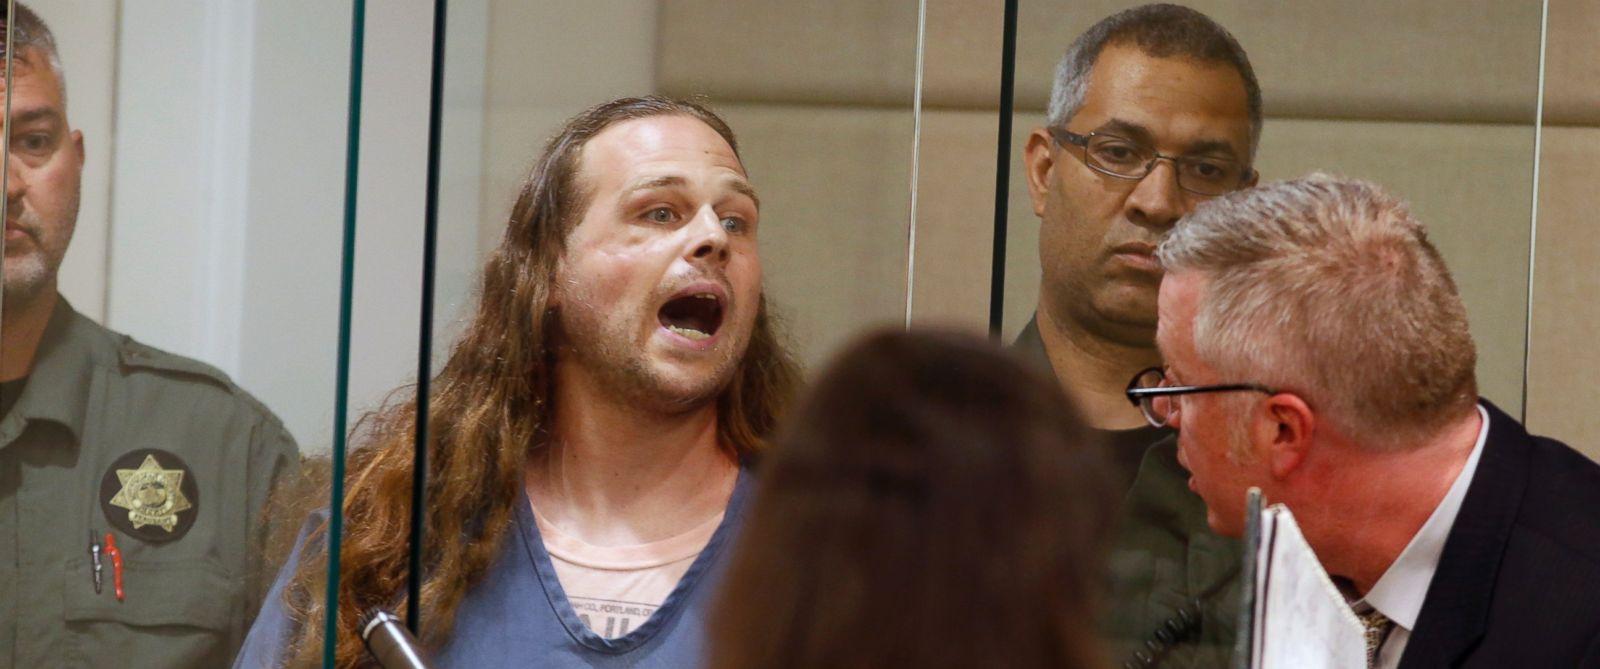 Image result for Portland attack